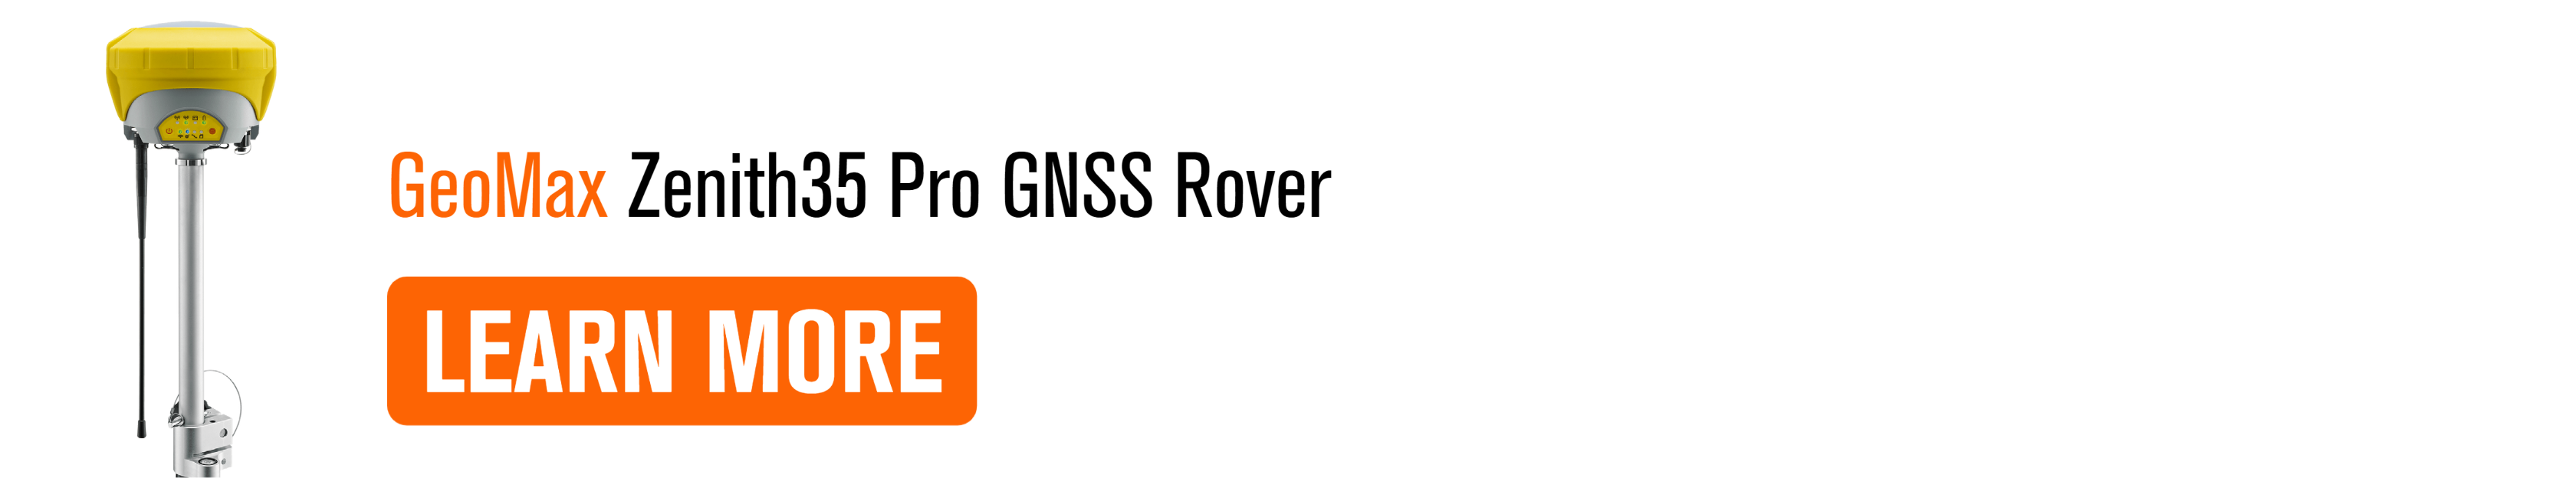 Zenith35 Pro GNSS Rover